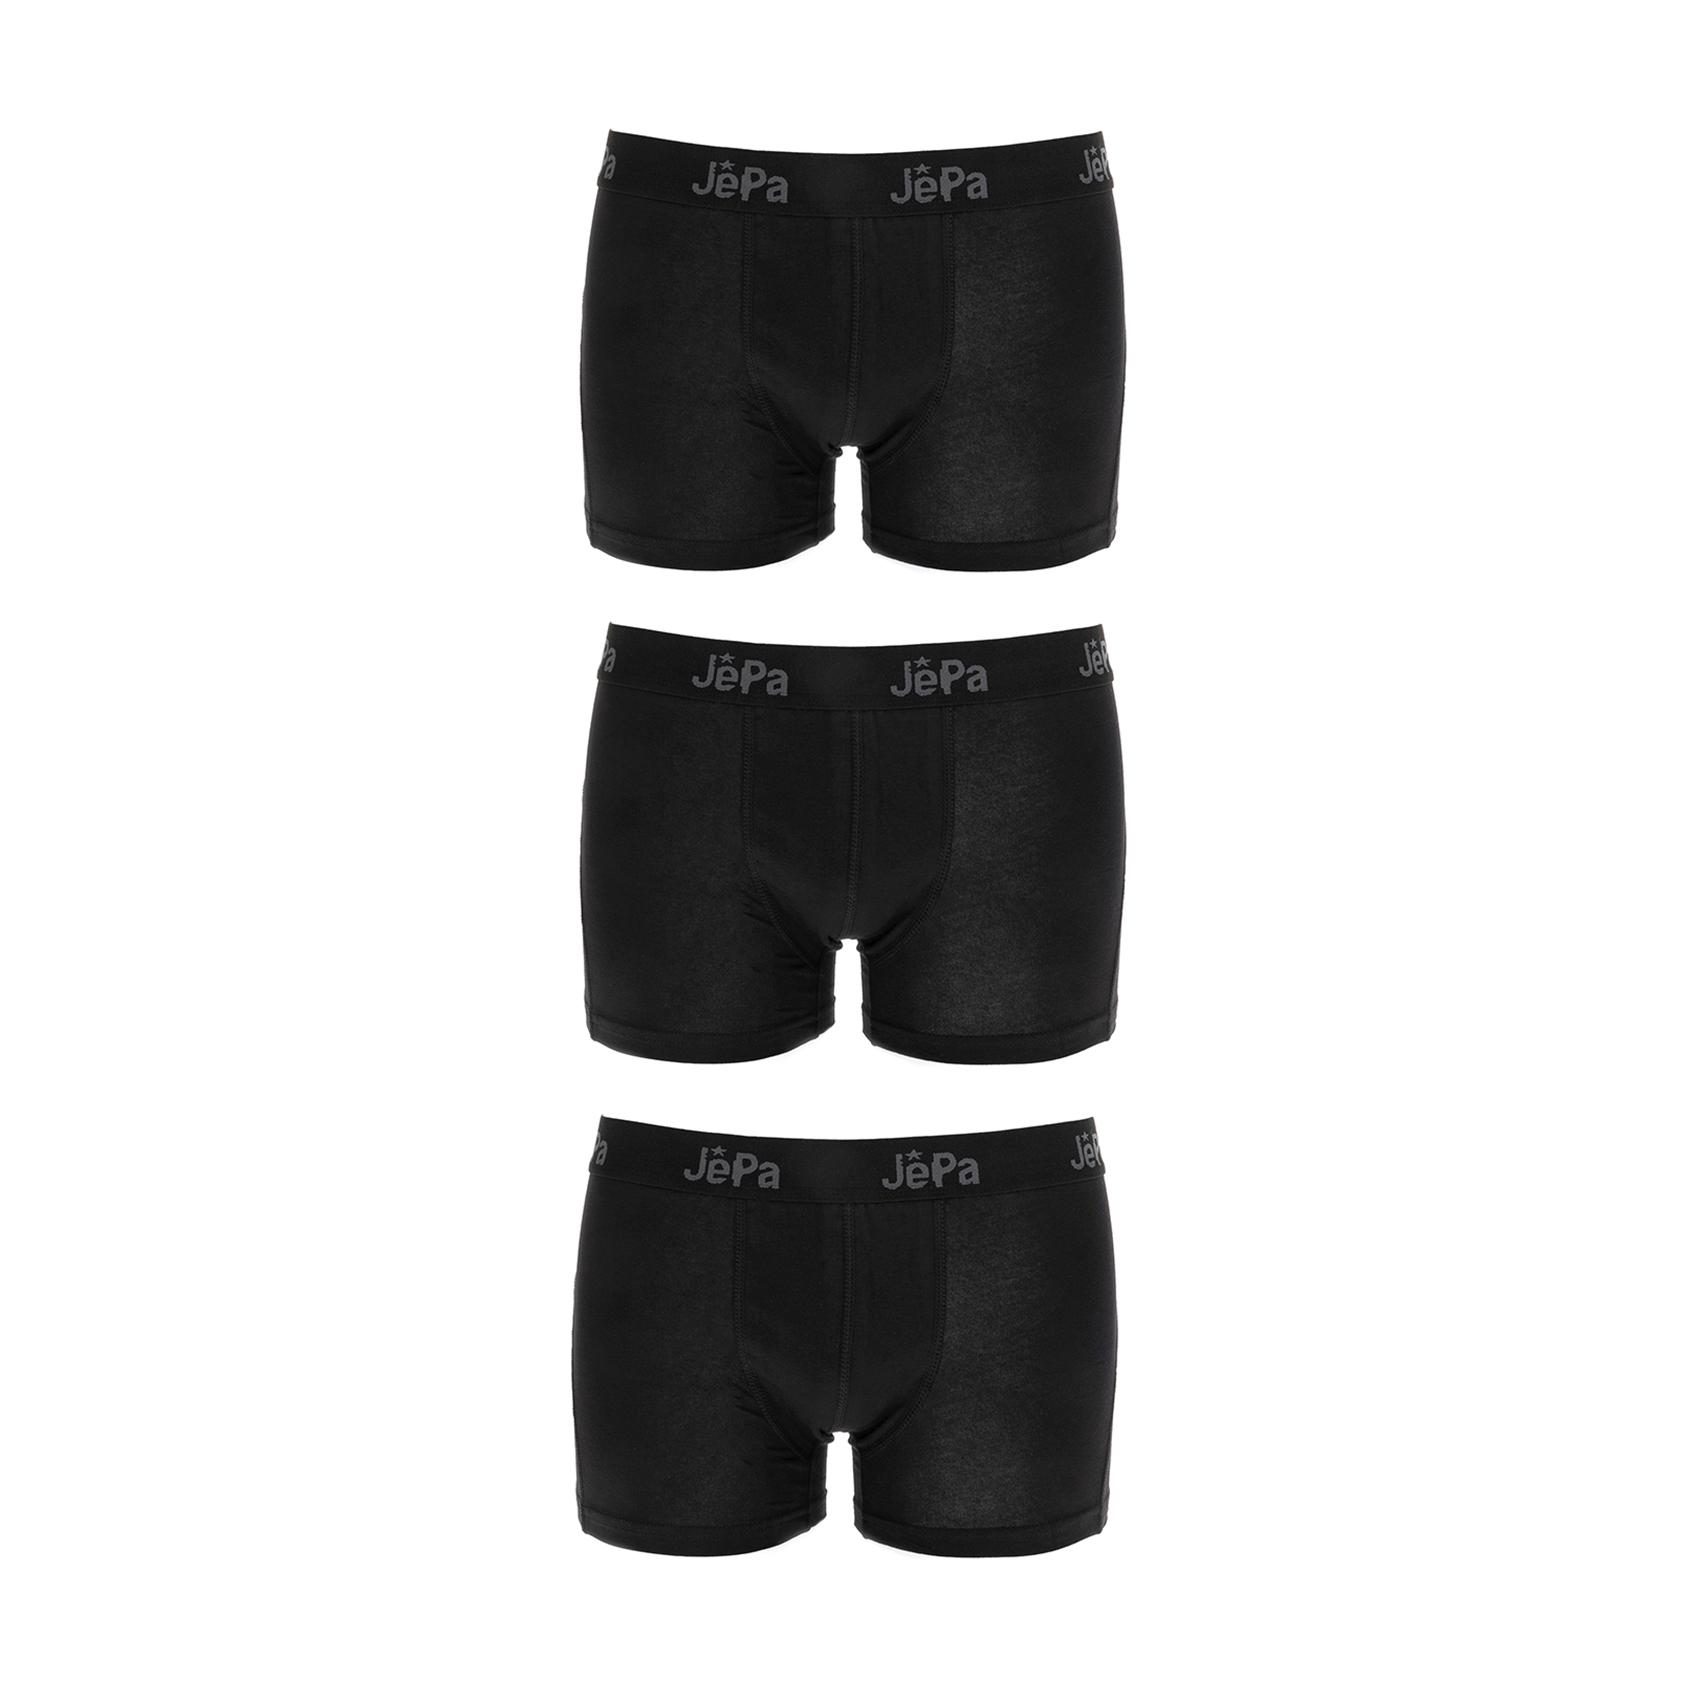 GSA - Σετ από 3 μπόξερ GSA μαύρα ανδρικά ρούχα εσώρουχα μπόξερ